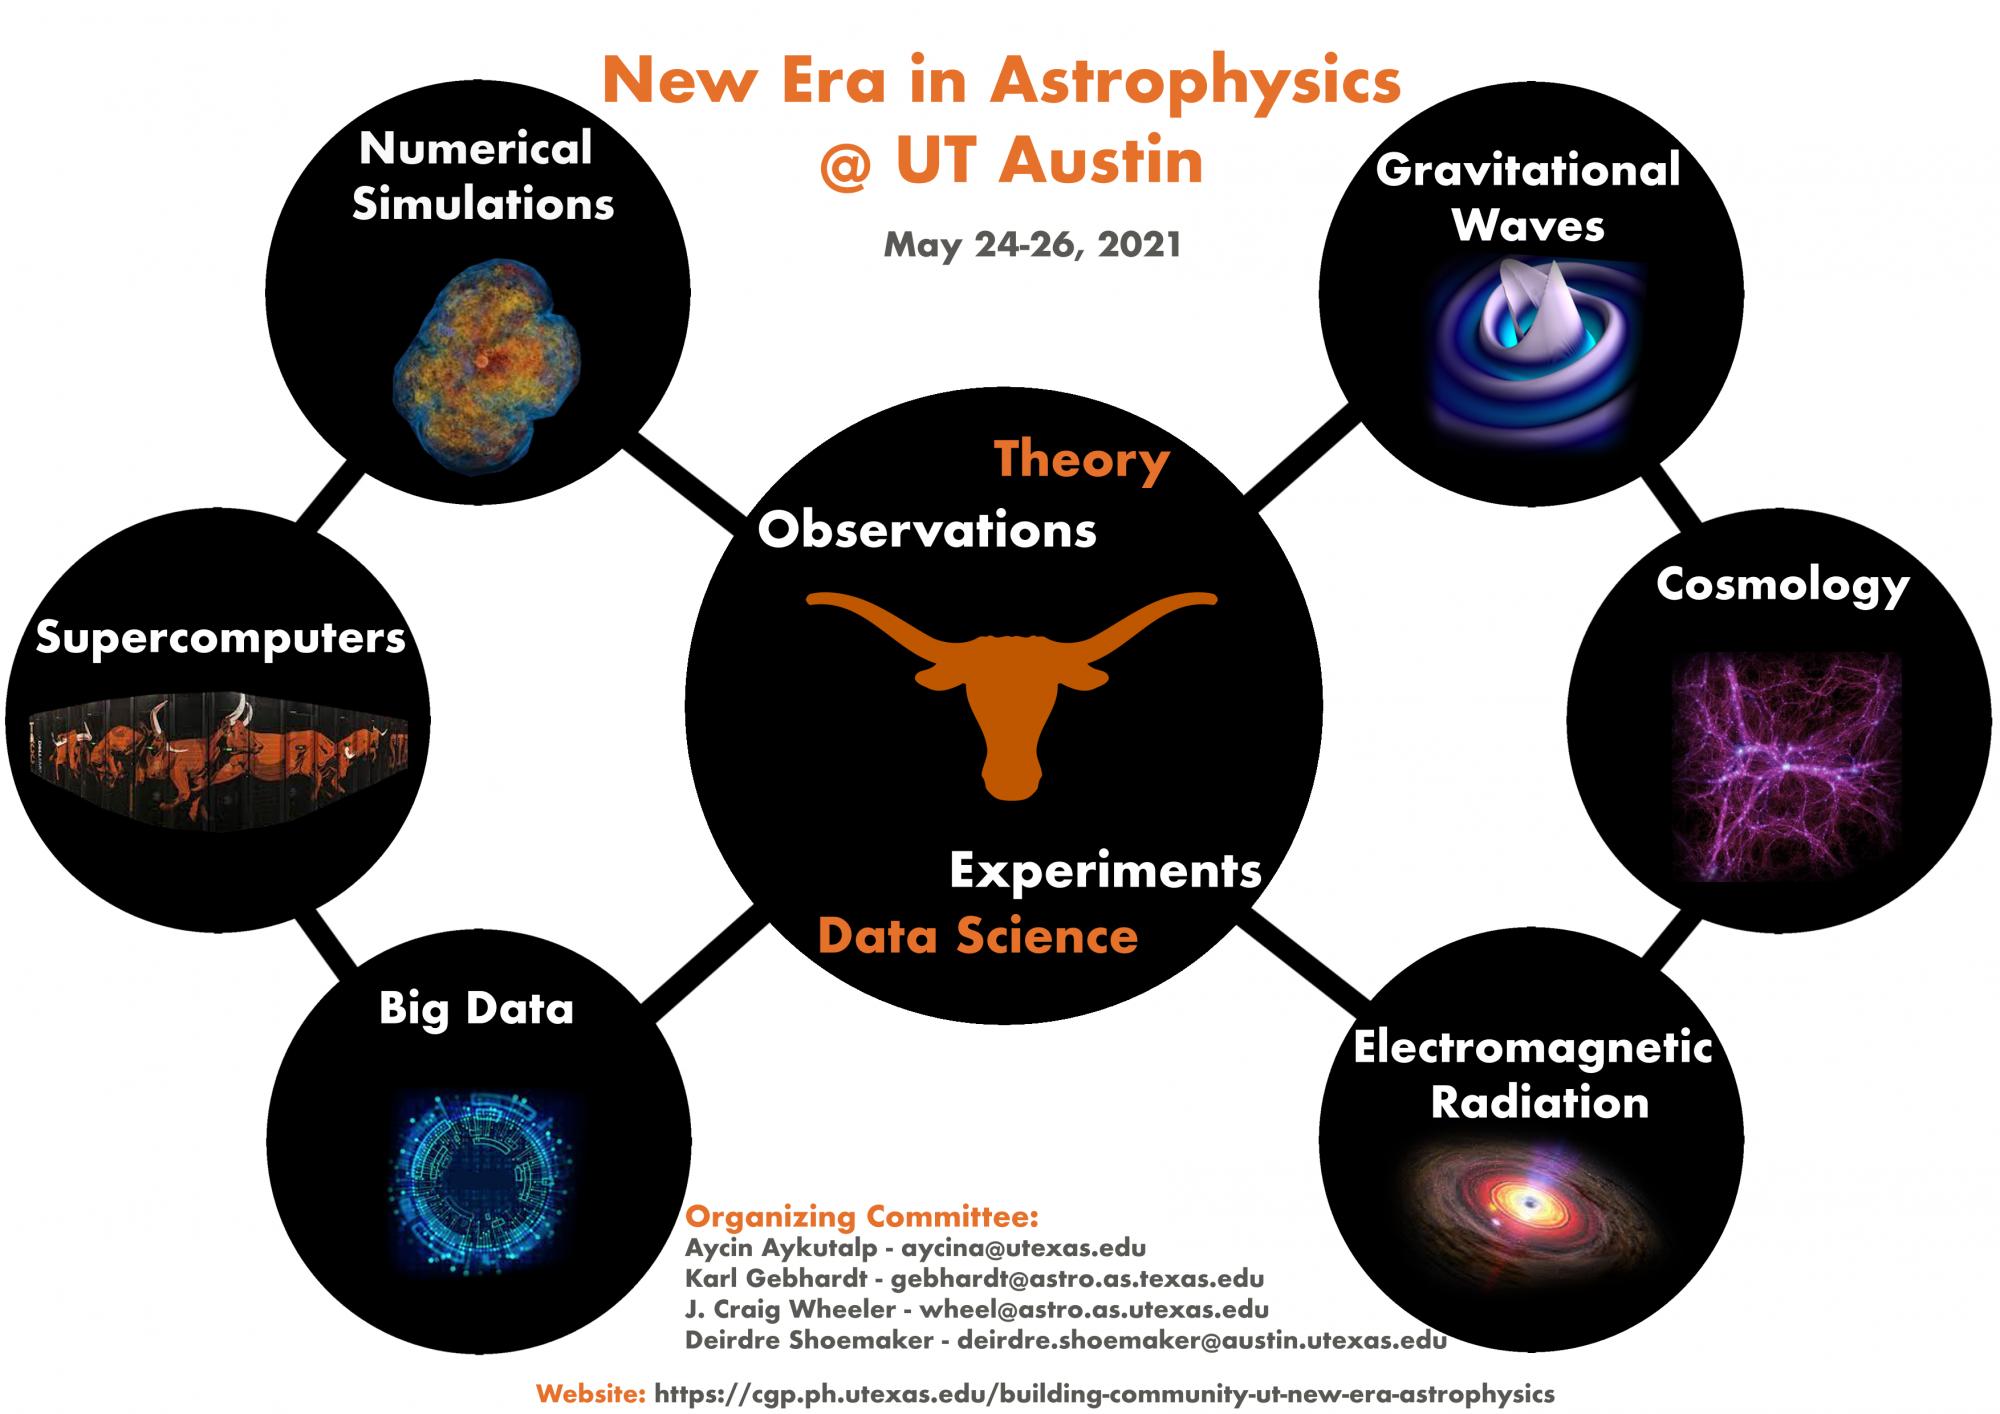 NewEraAstrophysics